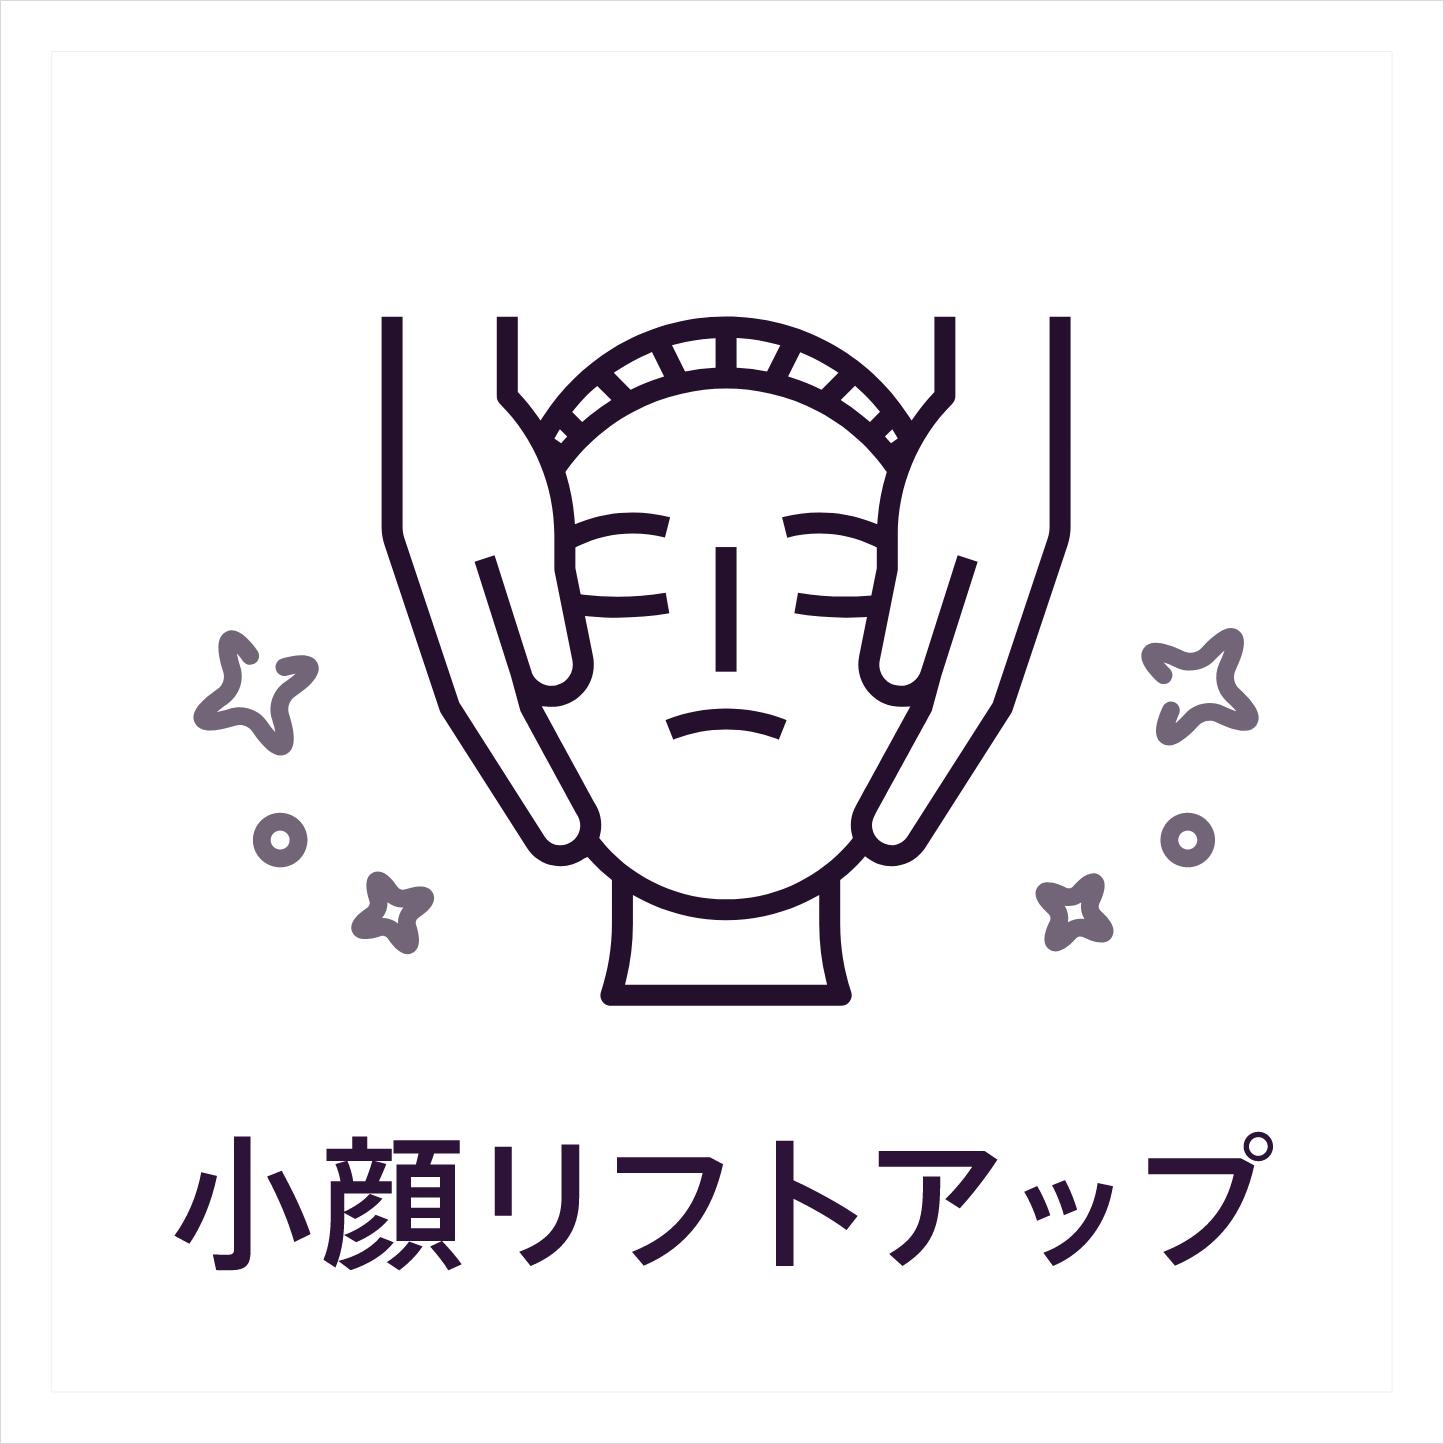 KAIZENBODY小顔リフトアップ講座(3時間研修)